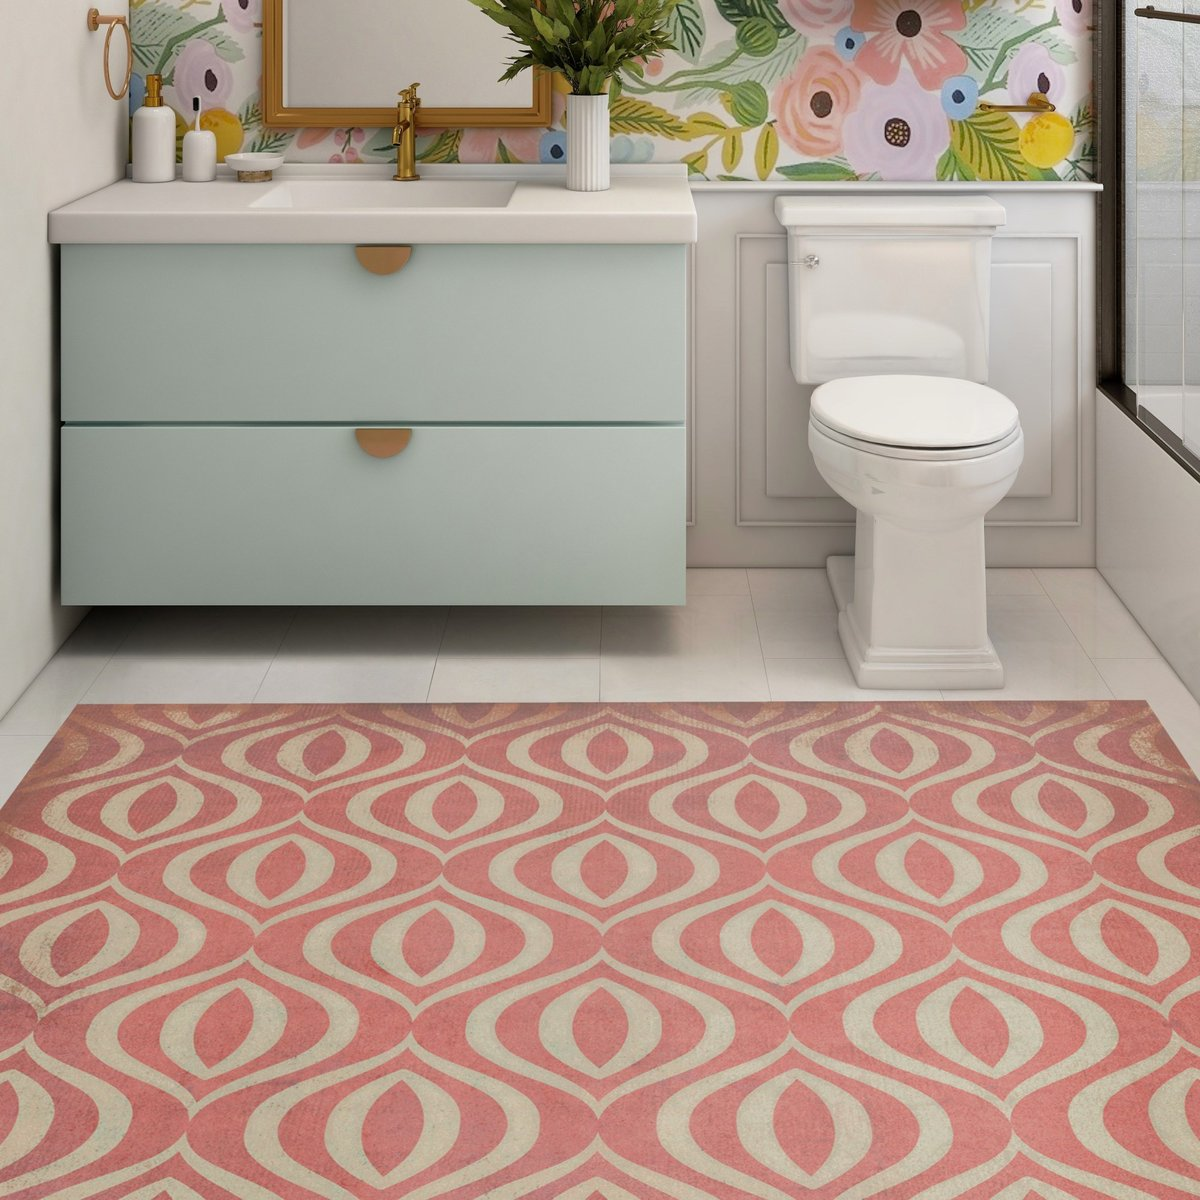 Colorful Bathroom Decor Ideas